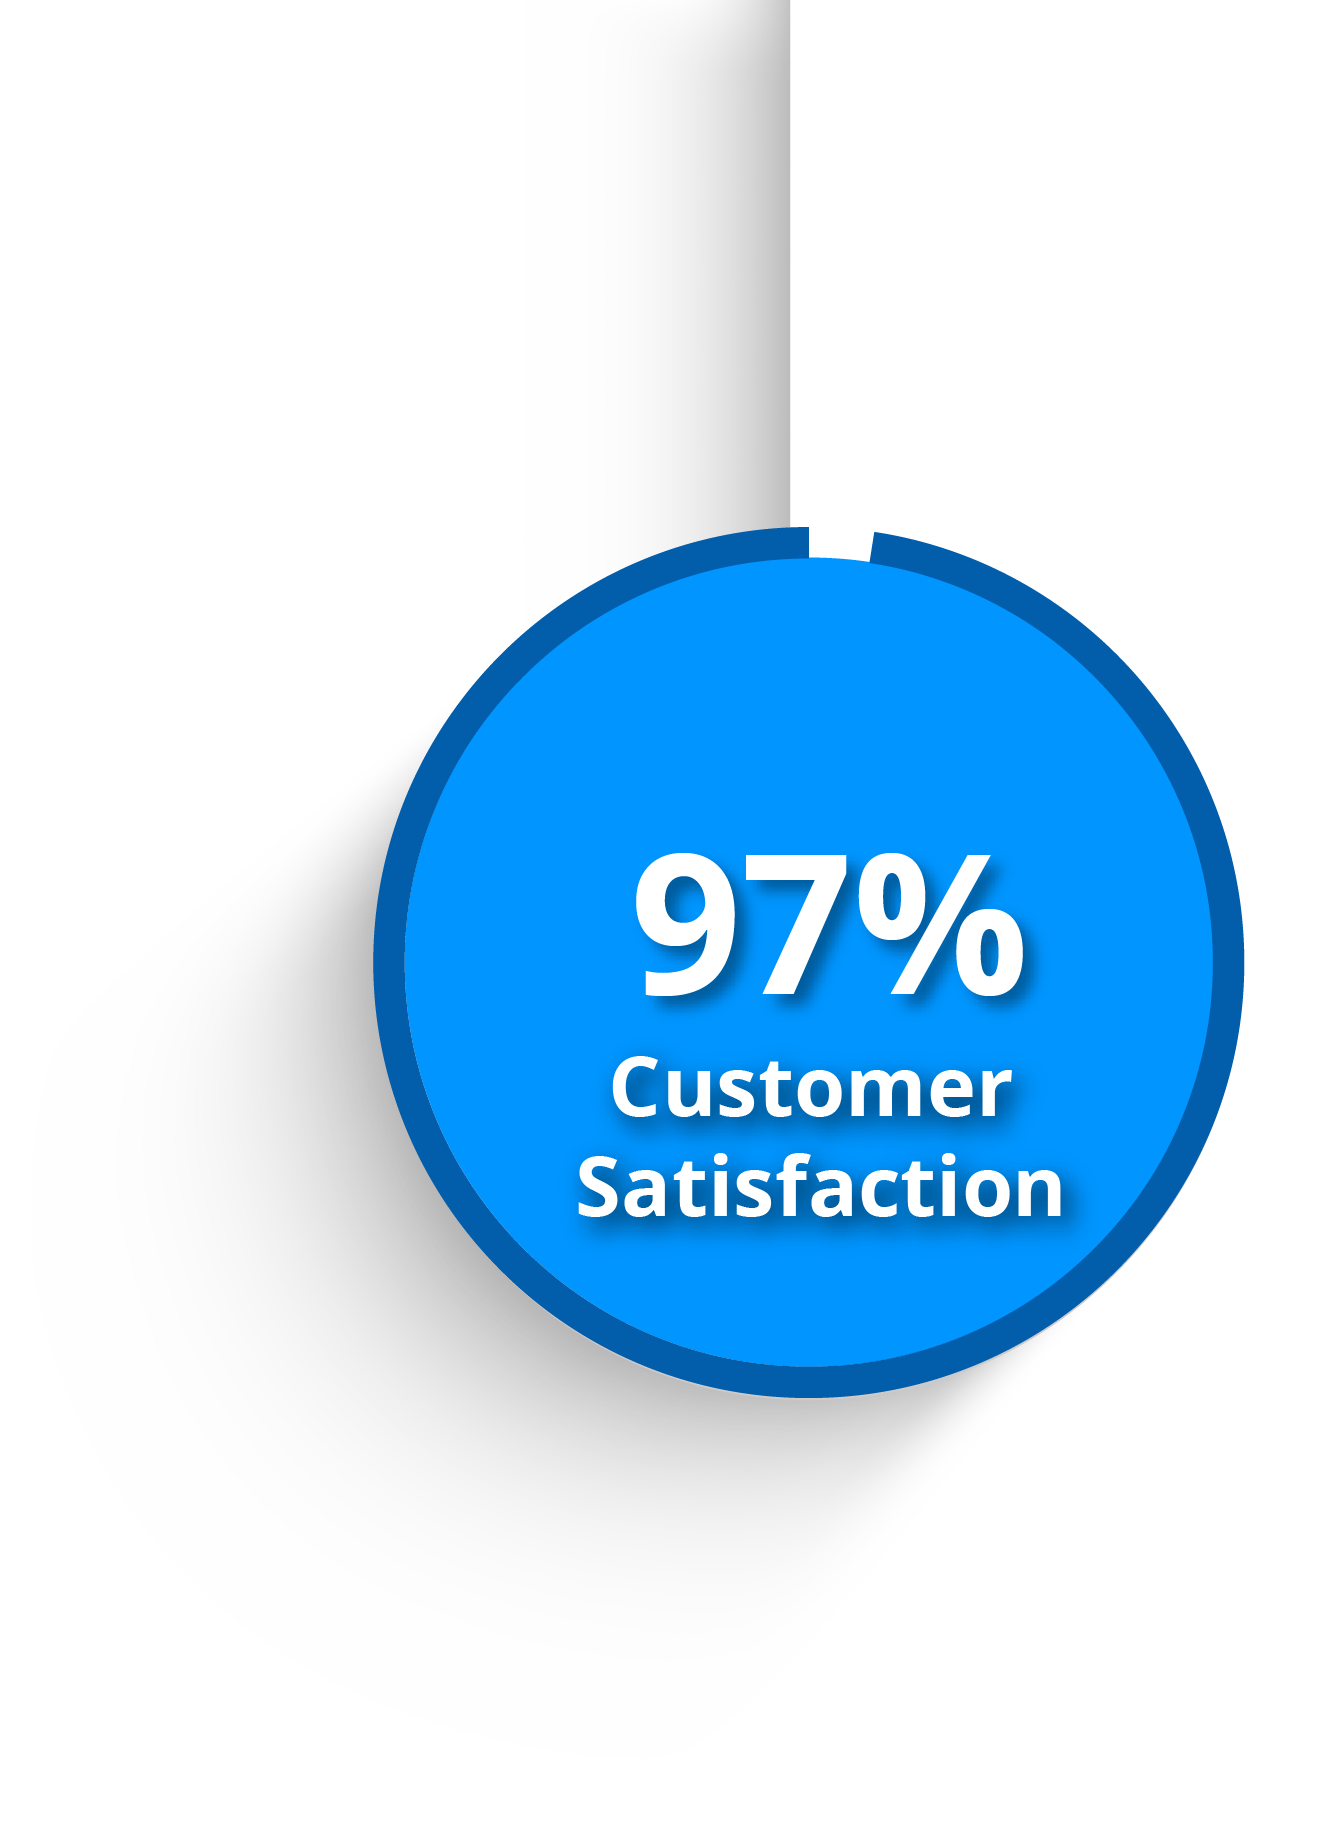 cloudmd365-stats-customer-satisfaction-10